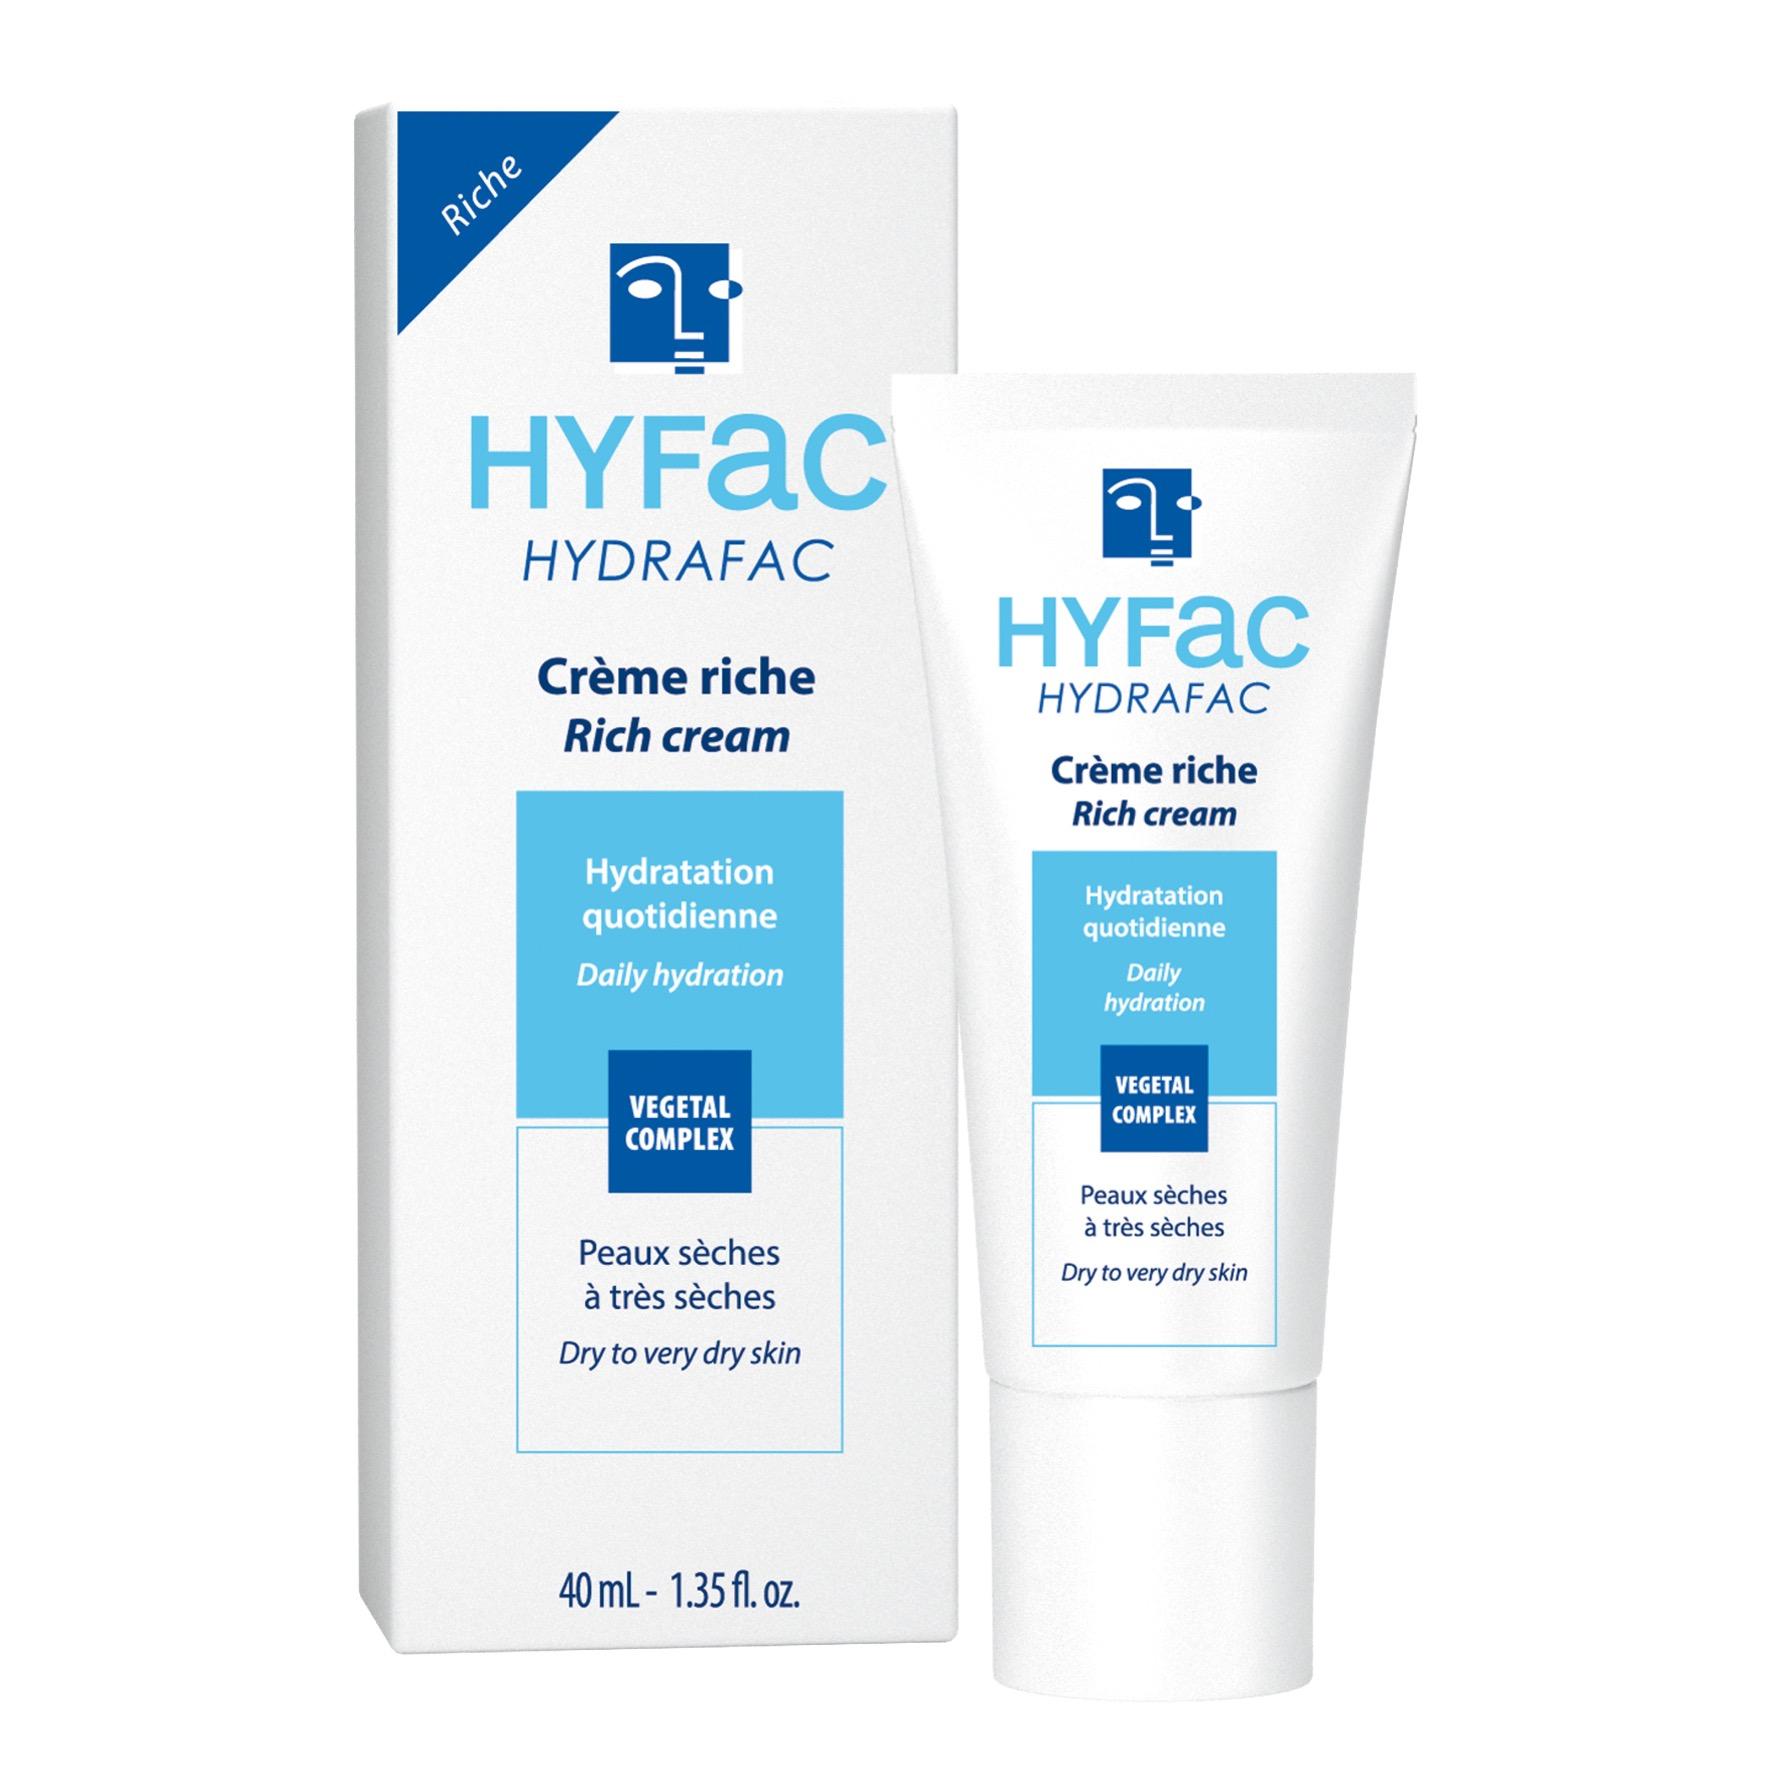 HYDRAFAC riche crème hydratante peaux sèches